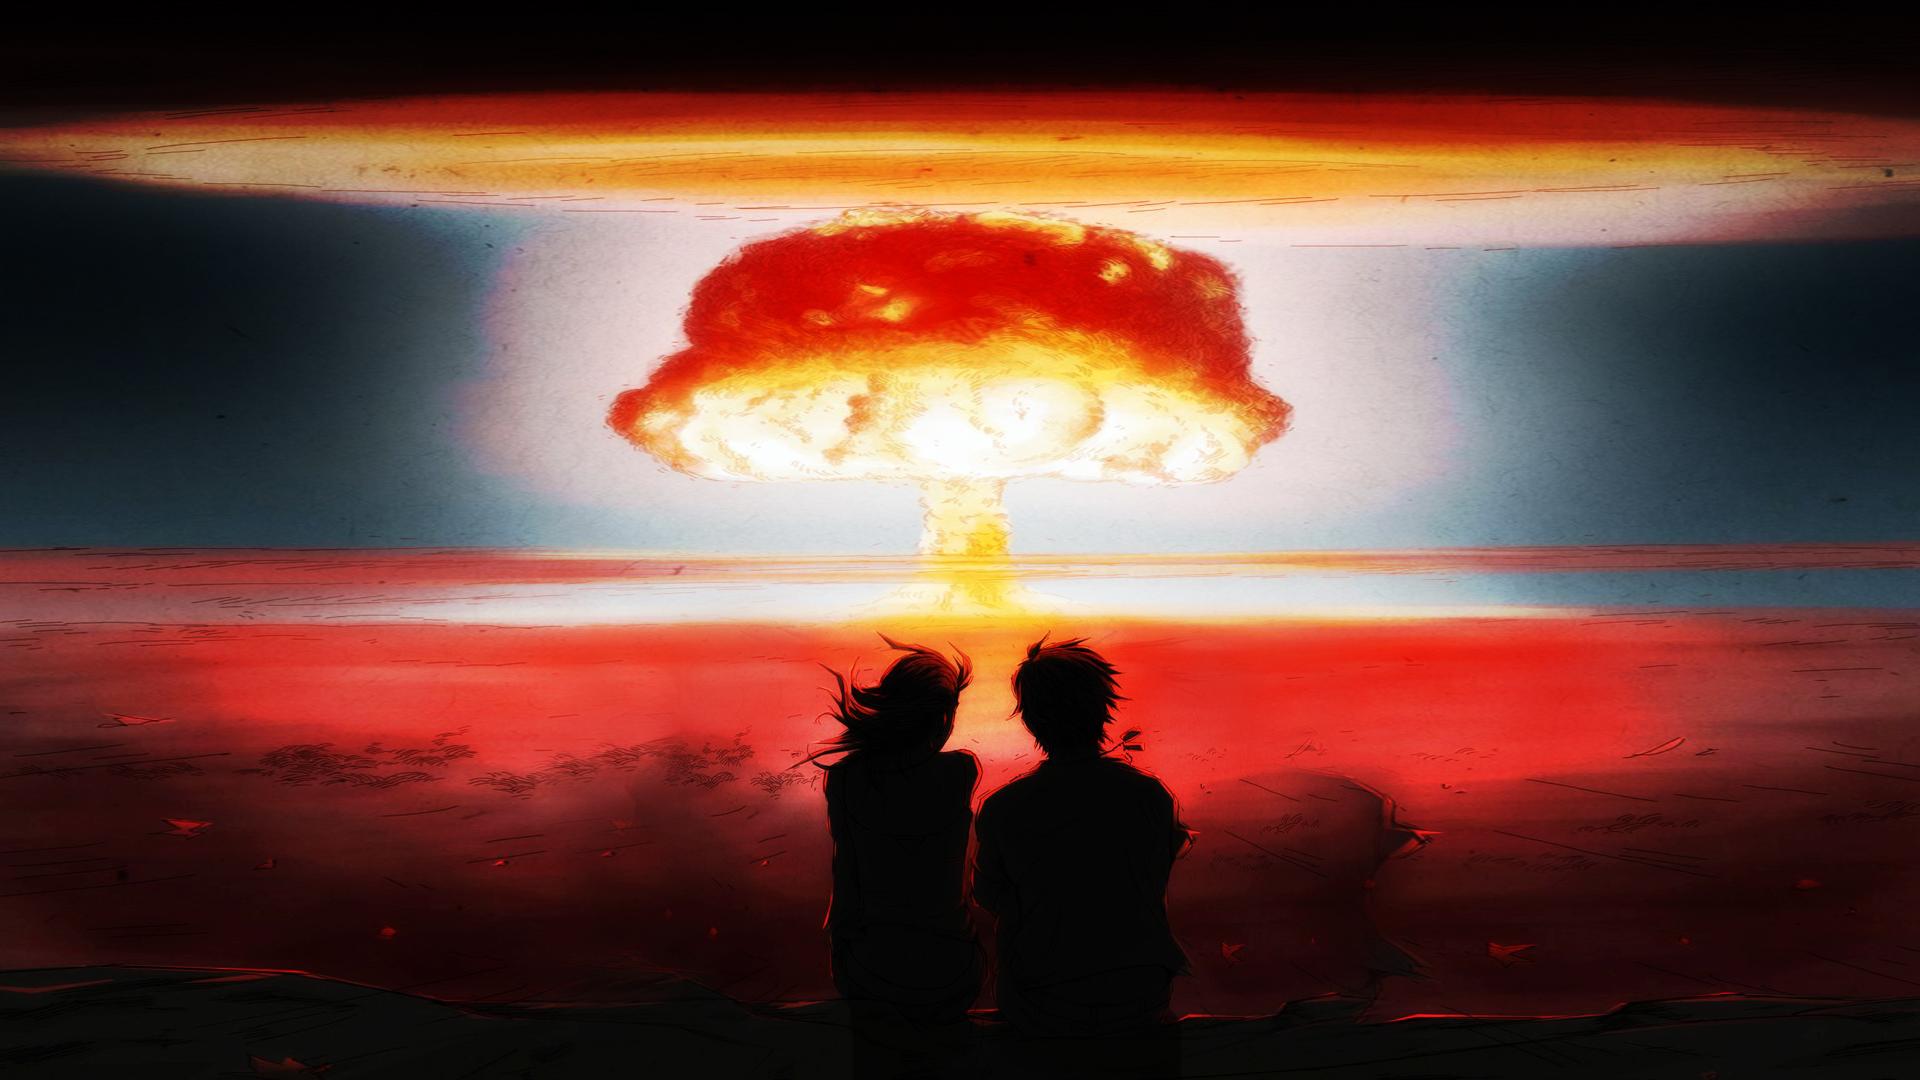 1920x1080-Nuclear-Blast-Bomb-Explosion-Anime-Drawing-Mushroom-Cloud-Nuclear-HD-wallpaper-wp340866